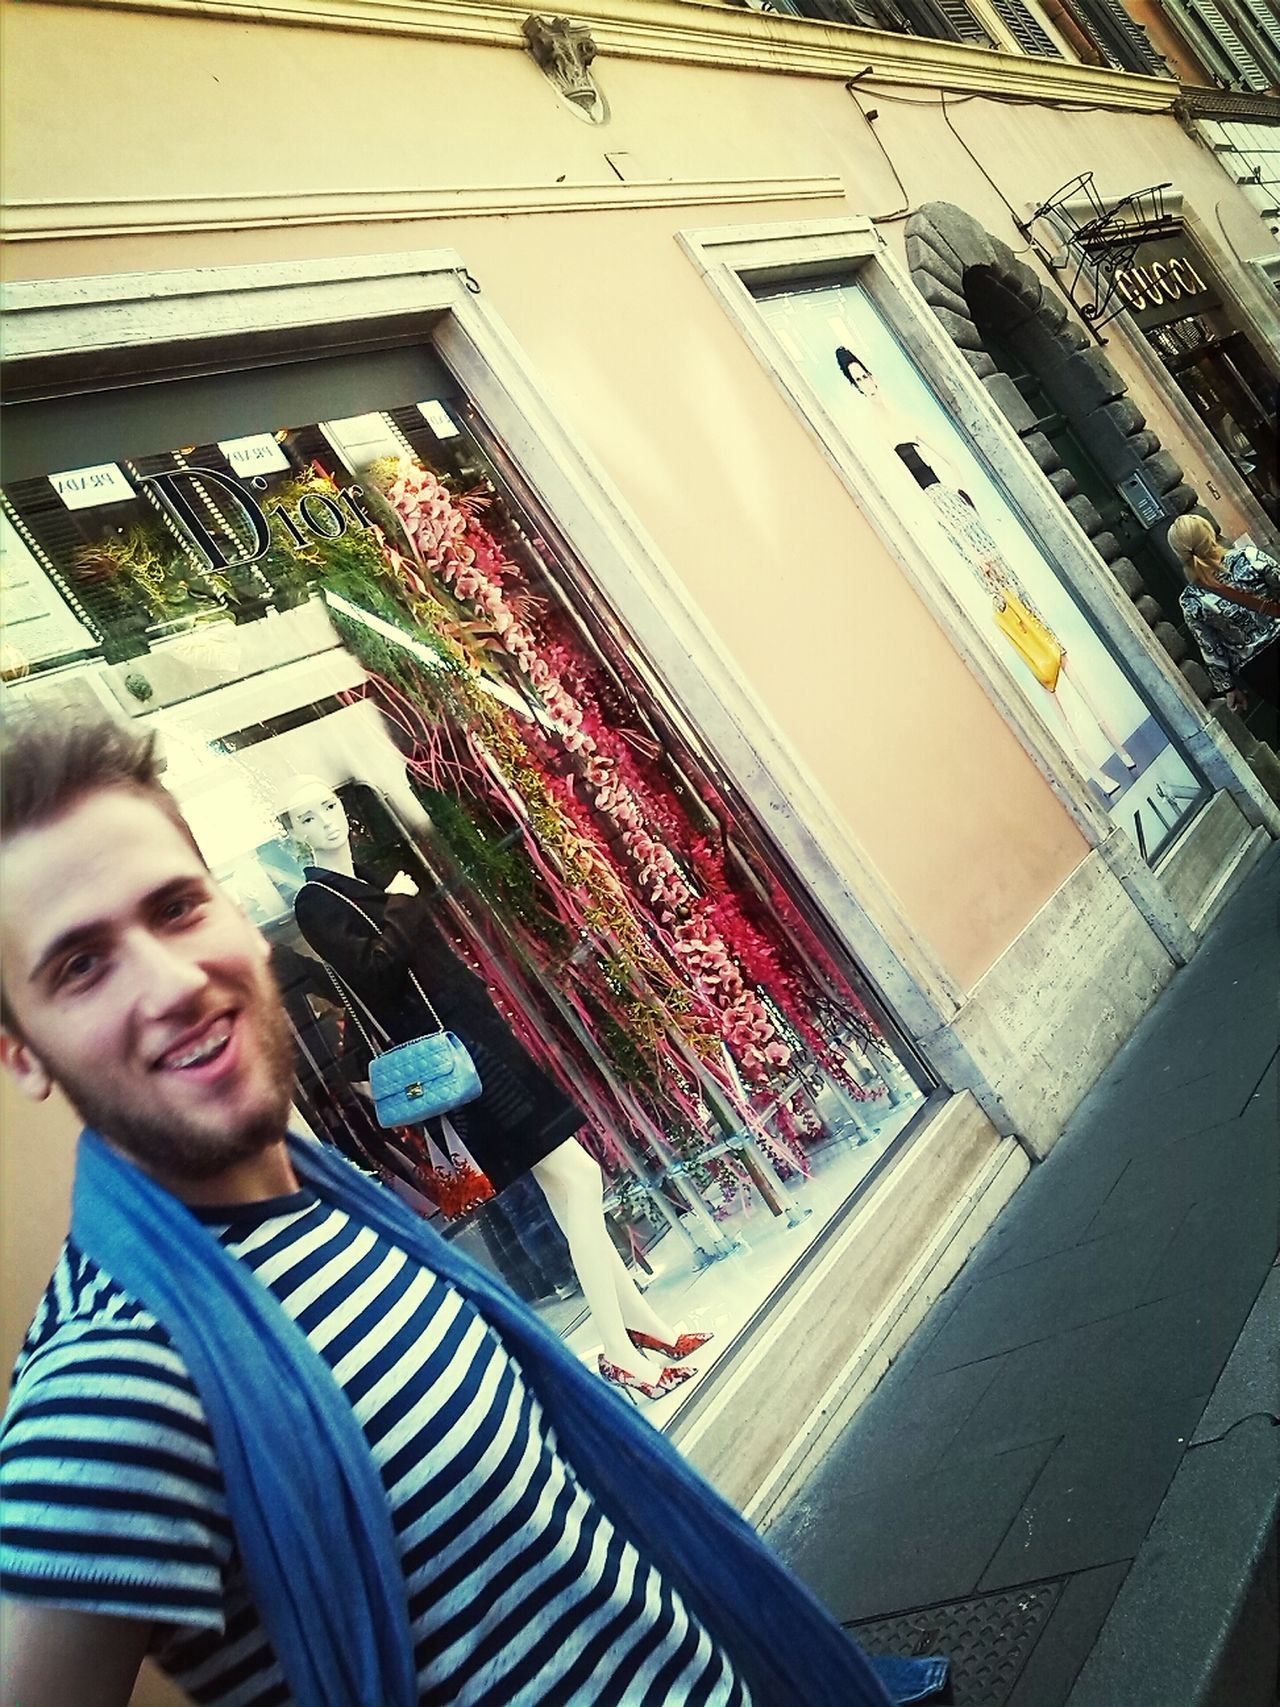 Via Condotti Streetphotography Hello World Beautiful Via Dei Condotti Rome Rome Italy